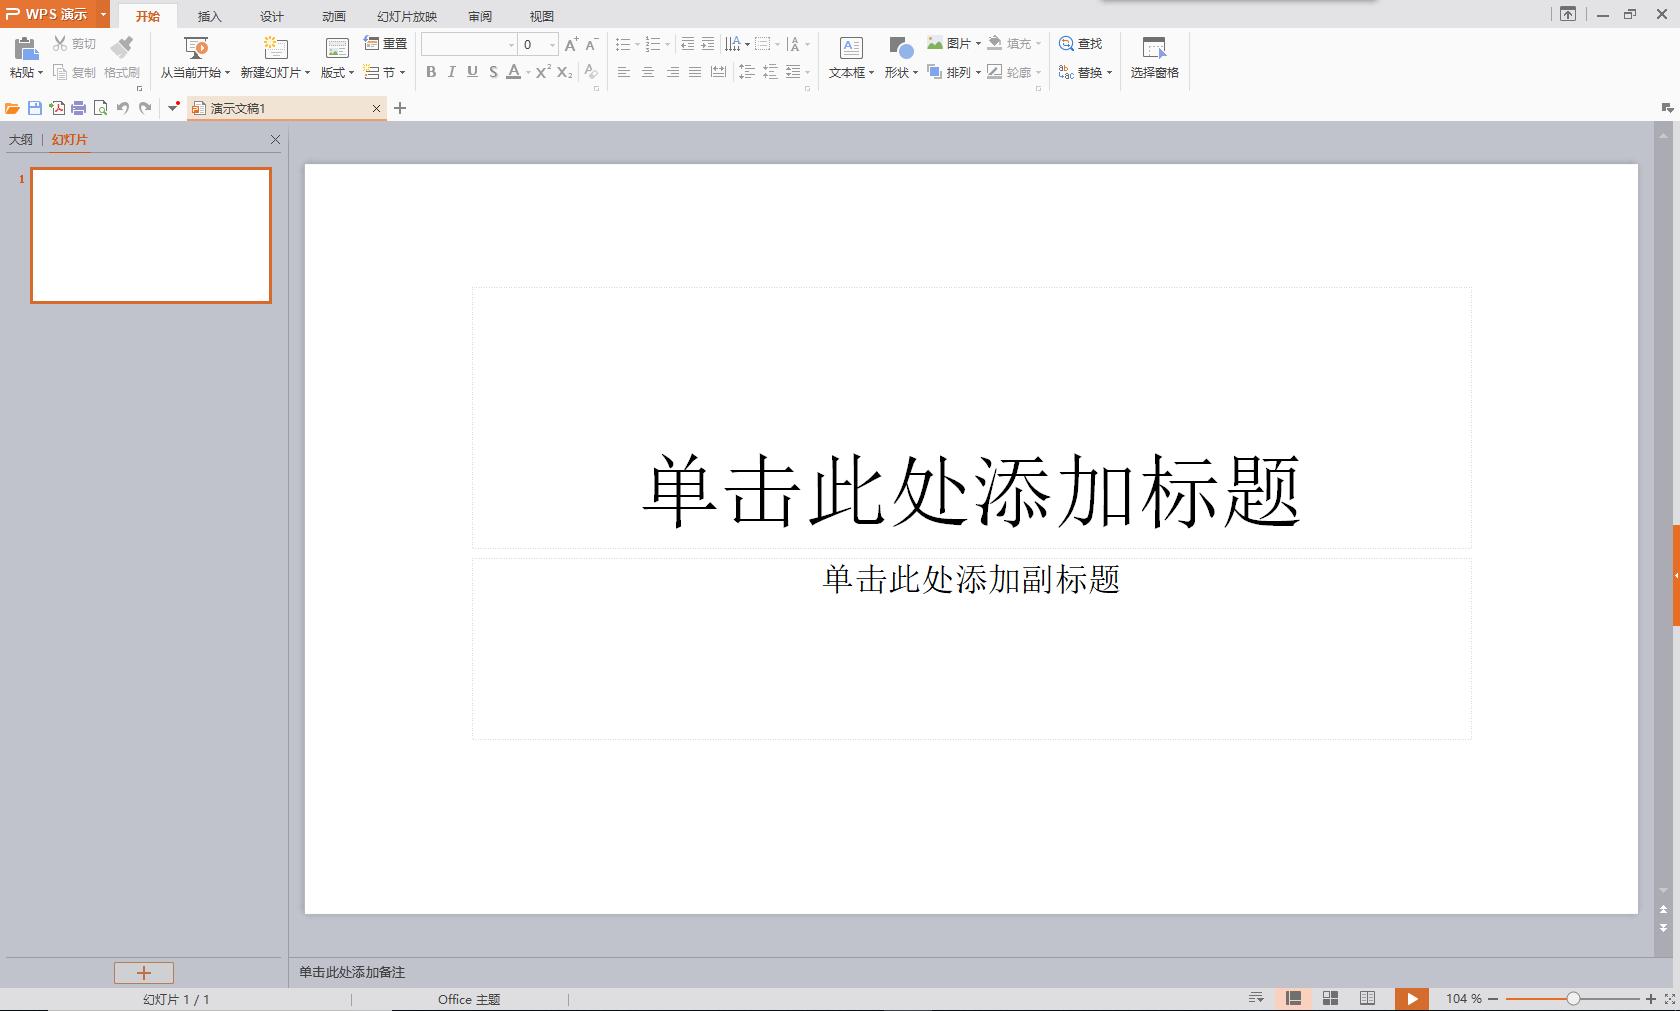 WPS office 2019 专业版精简优化自用版